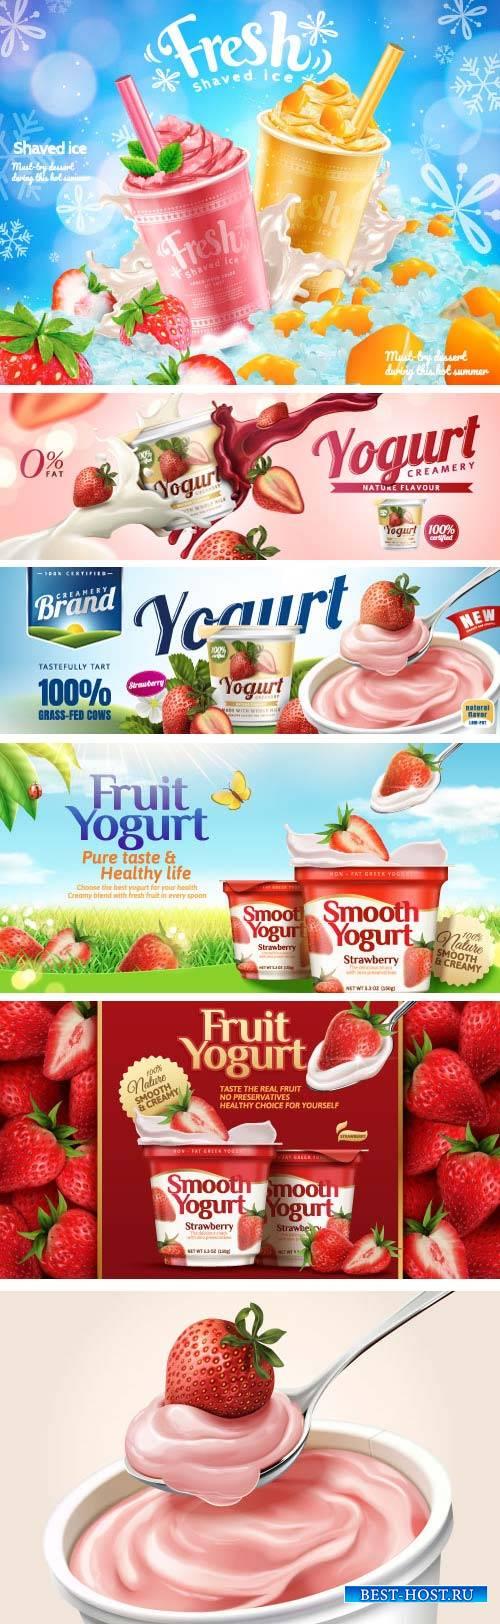 Berry yogurt ads vector illustration template